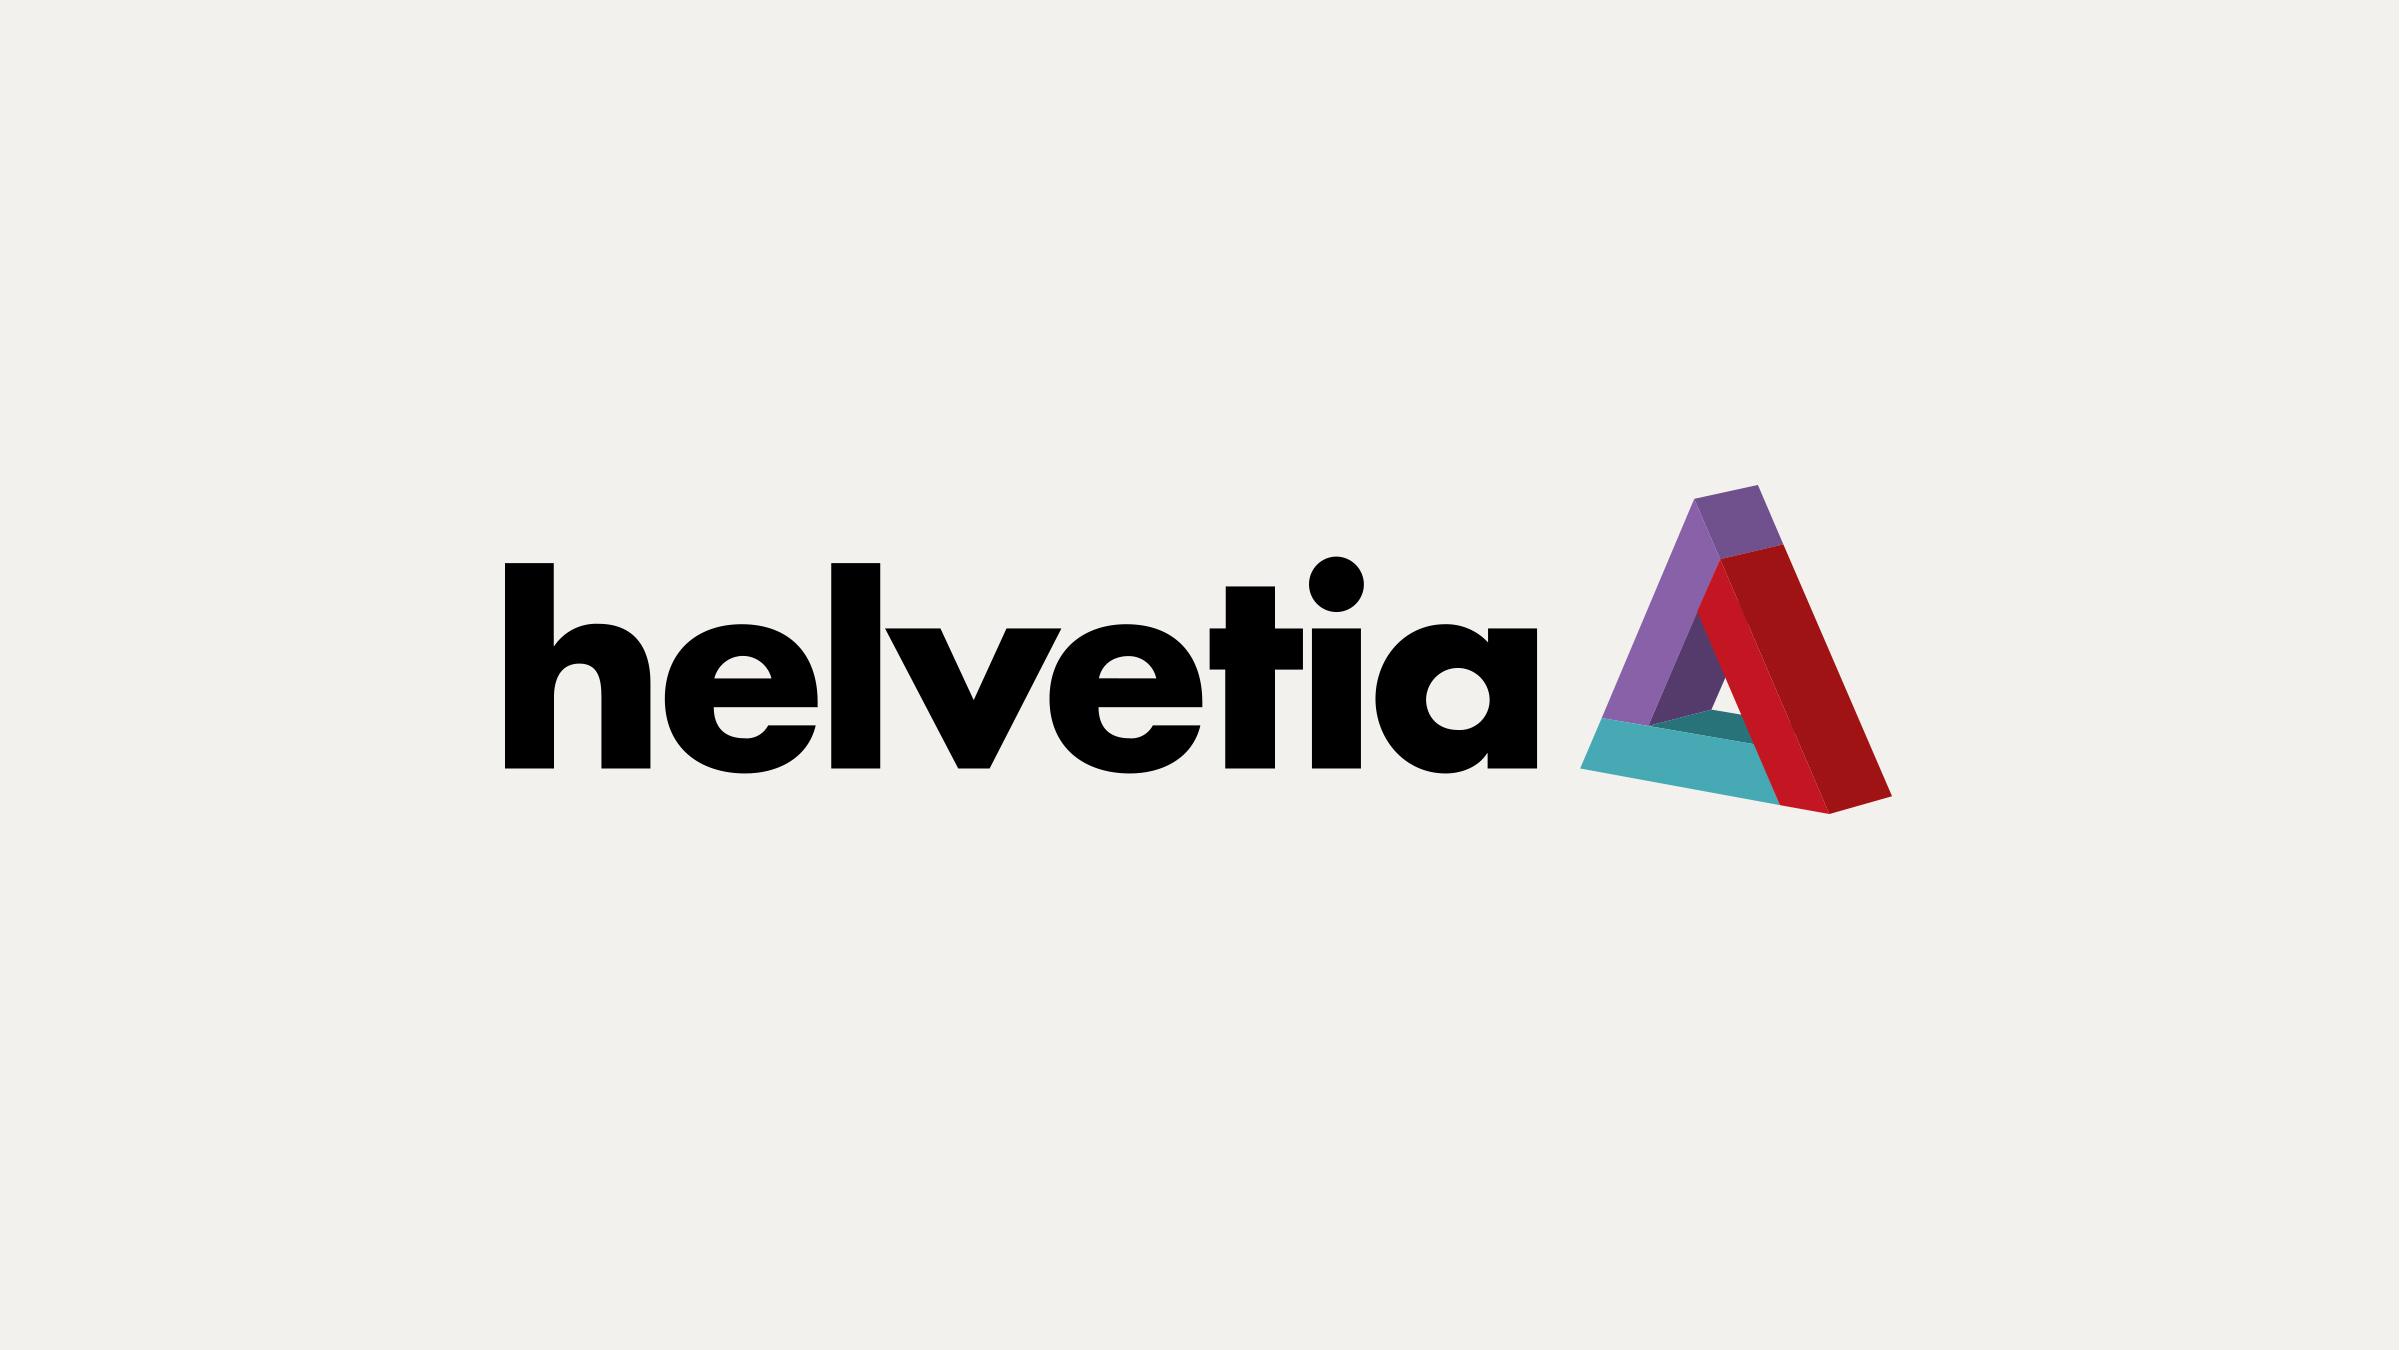 helvetia-logo